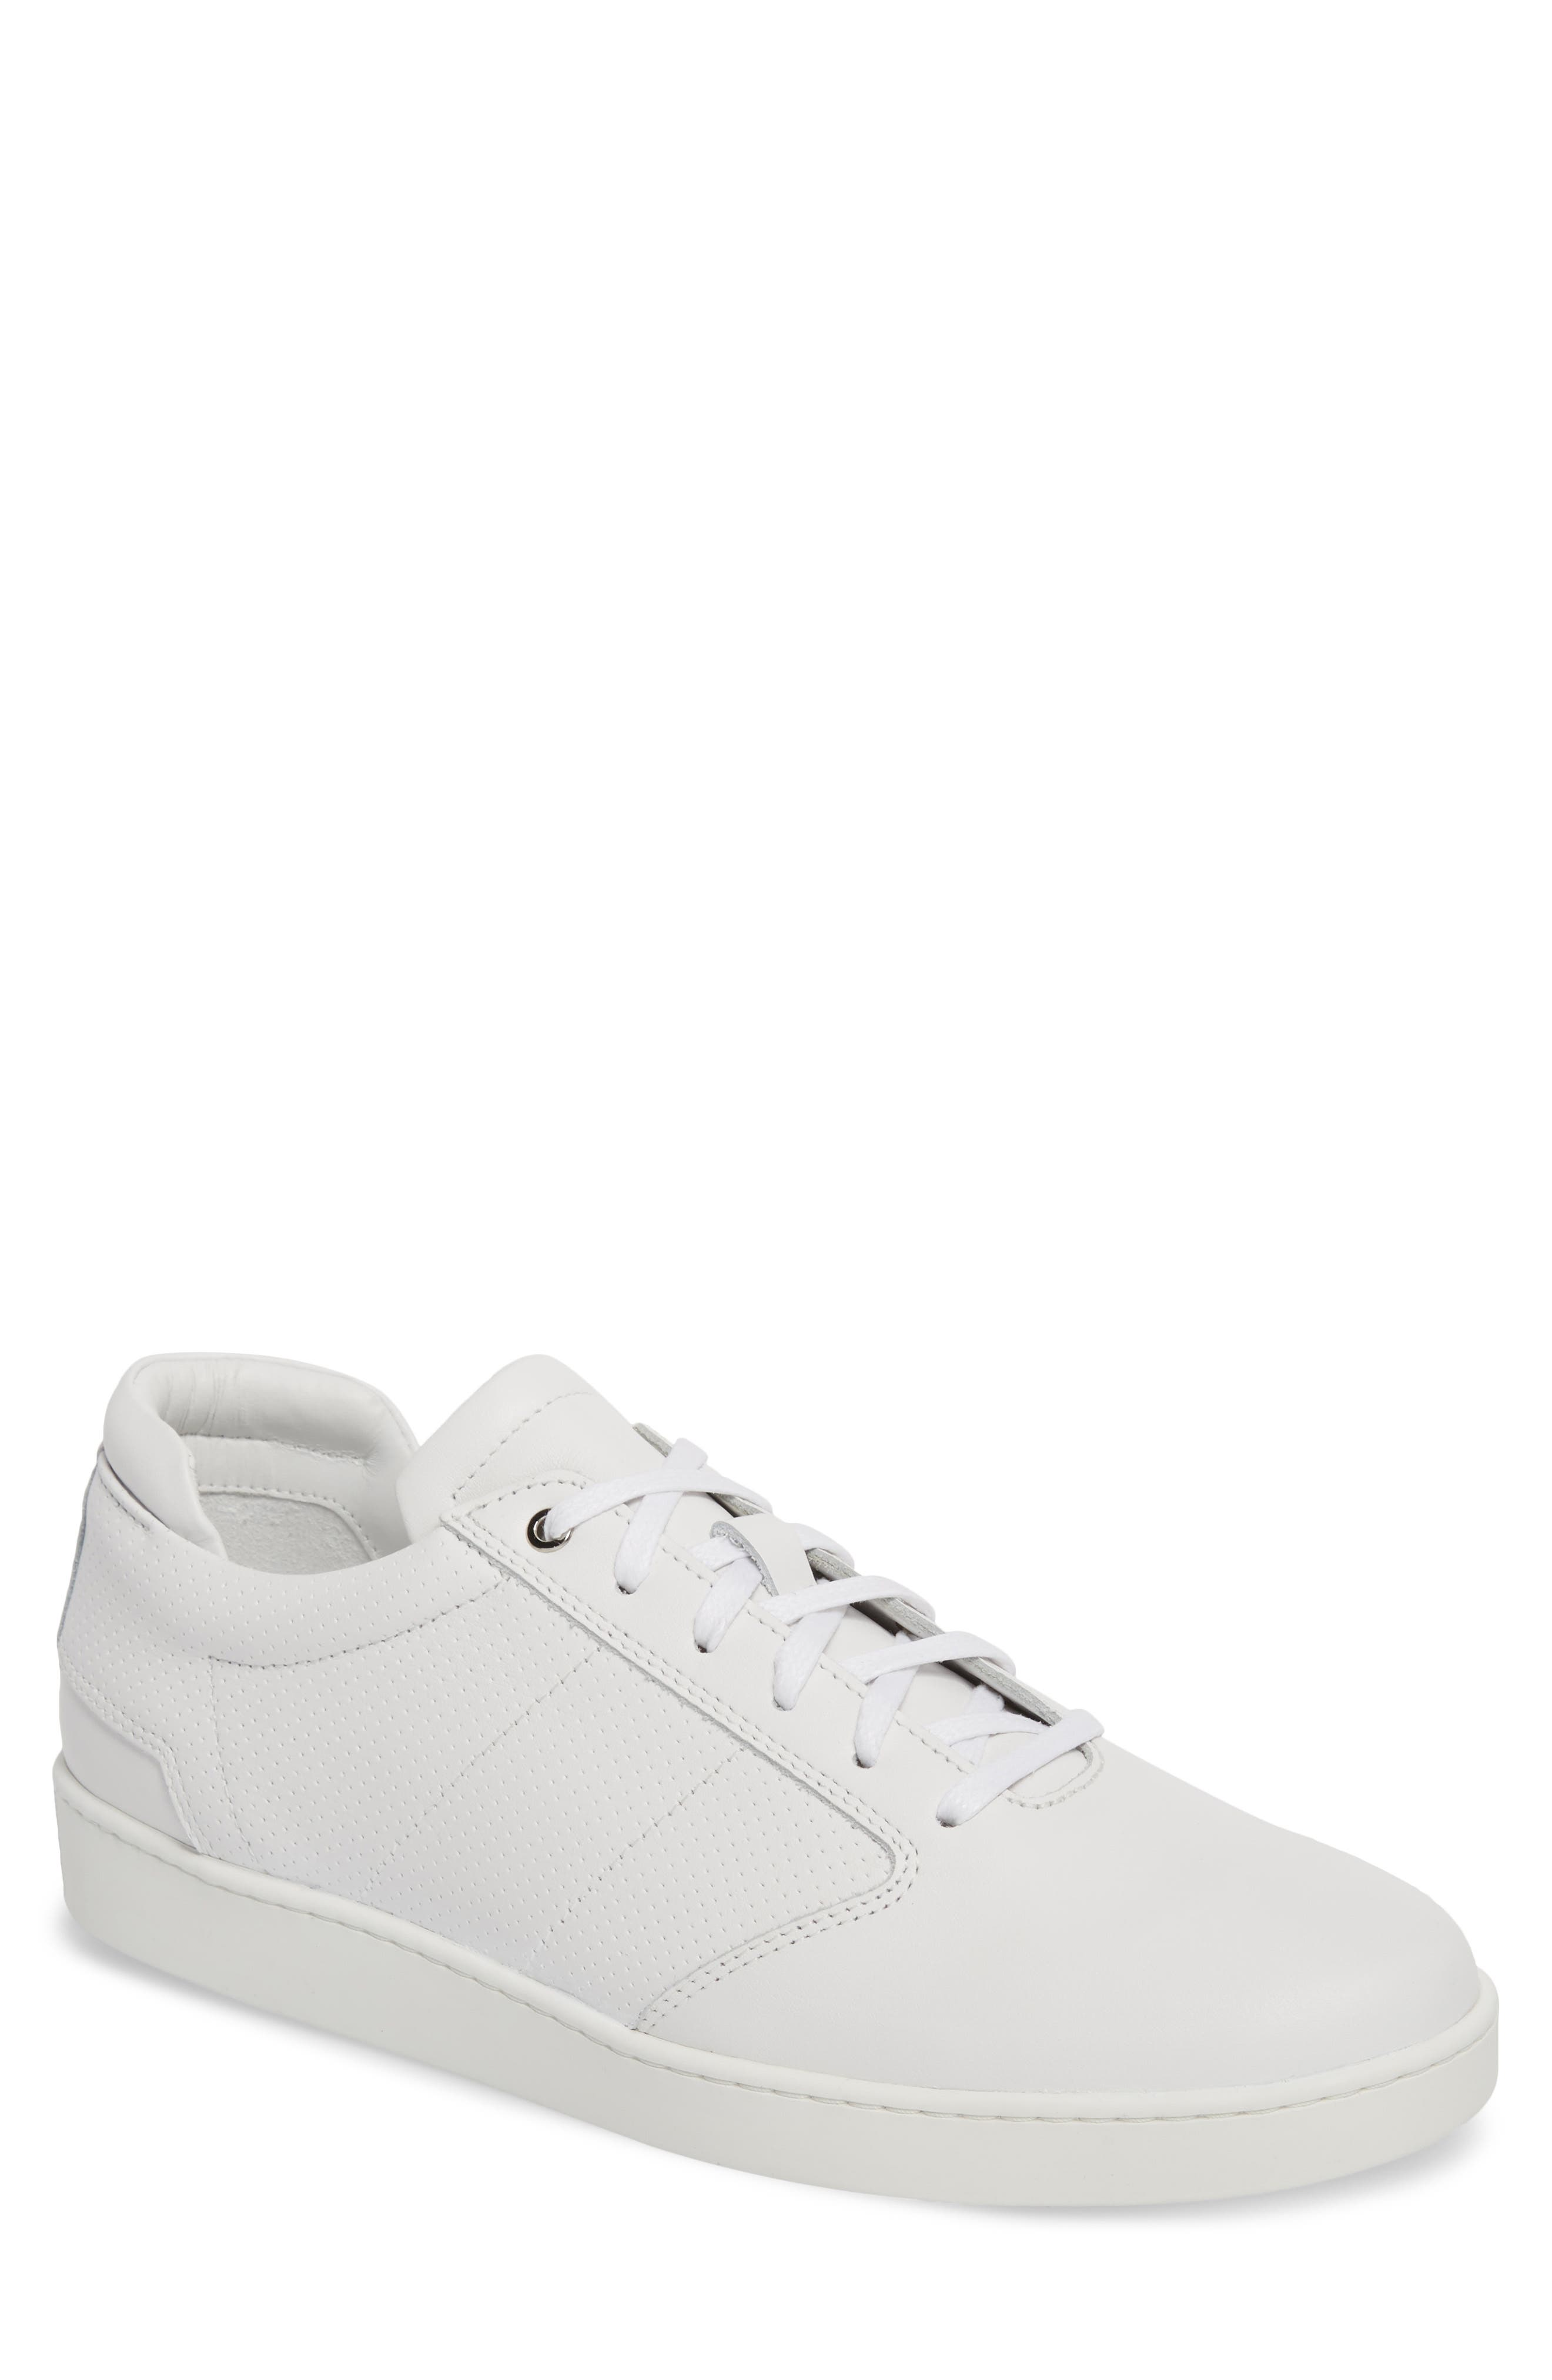 Lennon Sneaker,                             Main thumbnail 1, color,                             Multi Perforated White